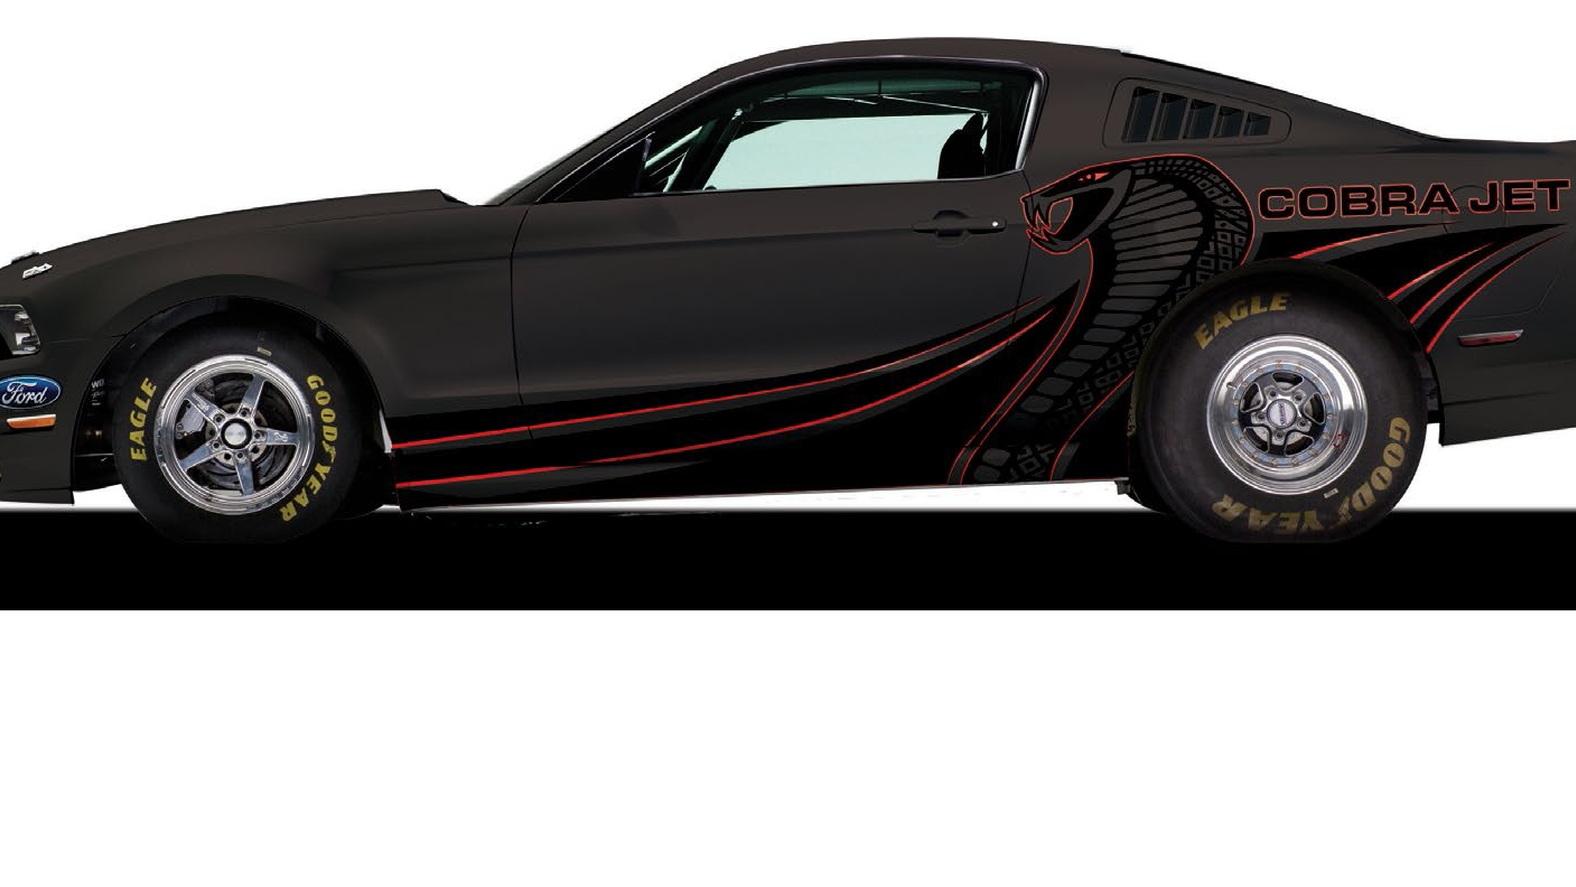 Cobra Jet Mustang >> 2014 Ford Mustang Cobra Jet Details Announced